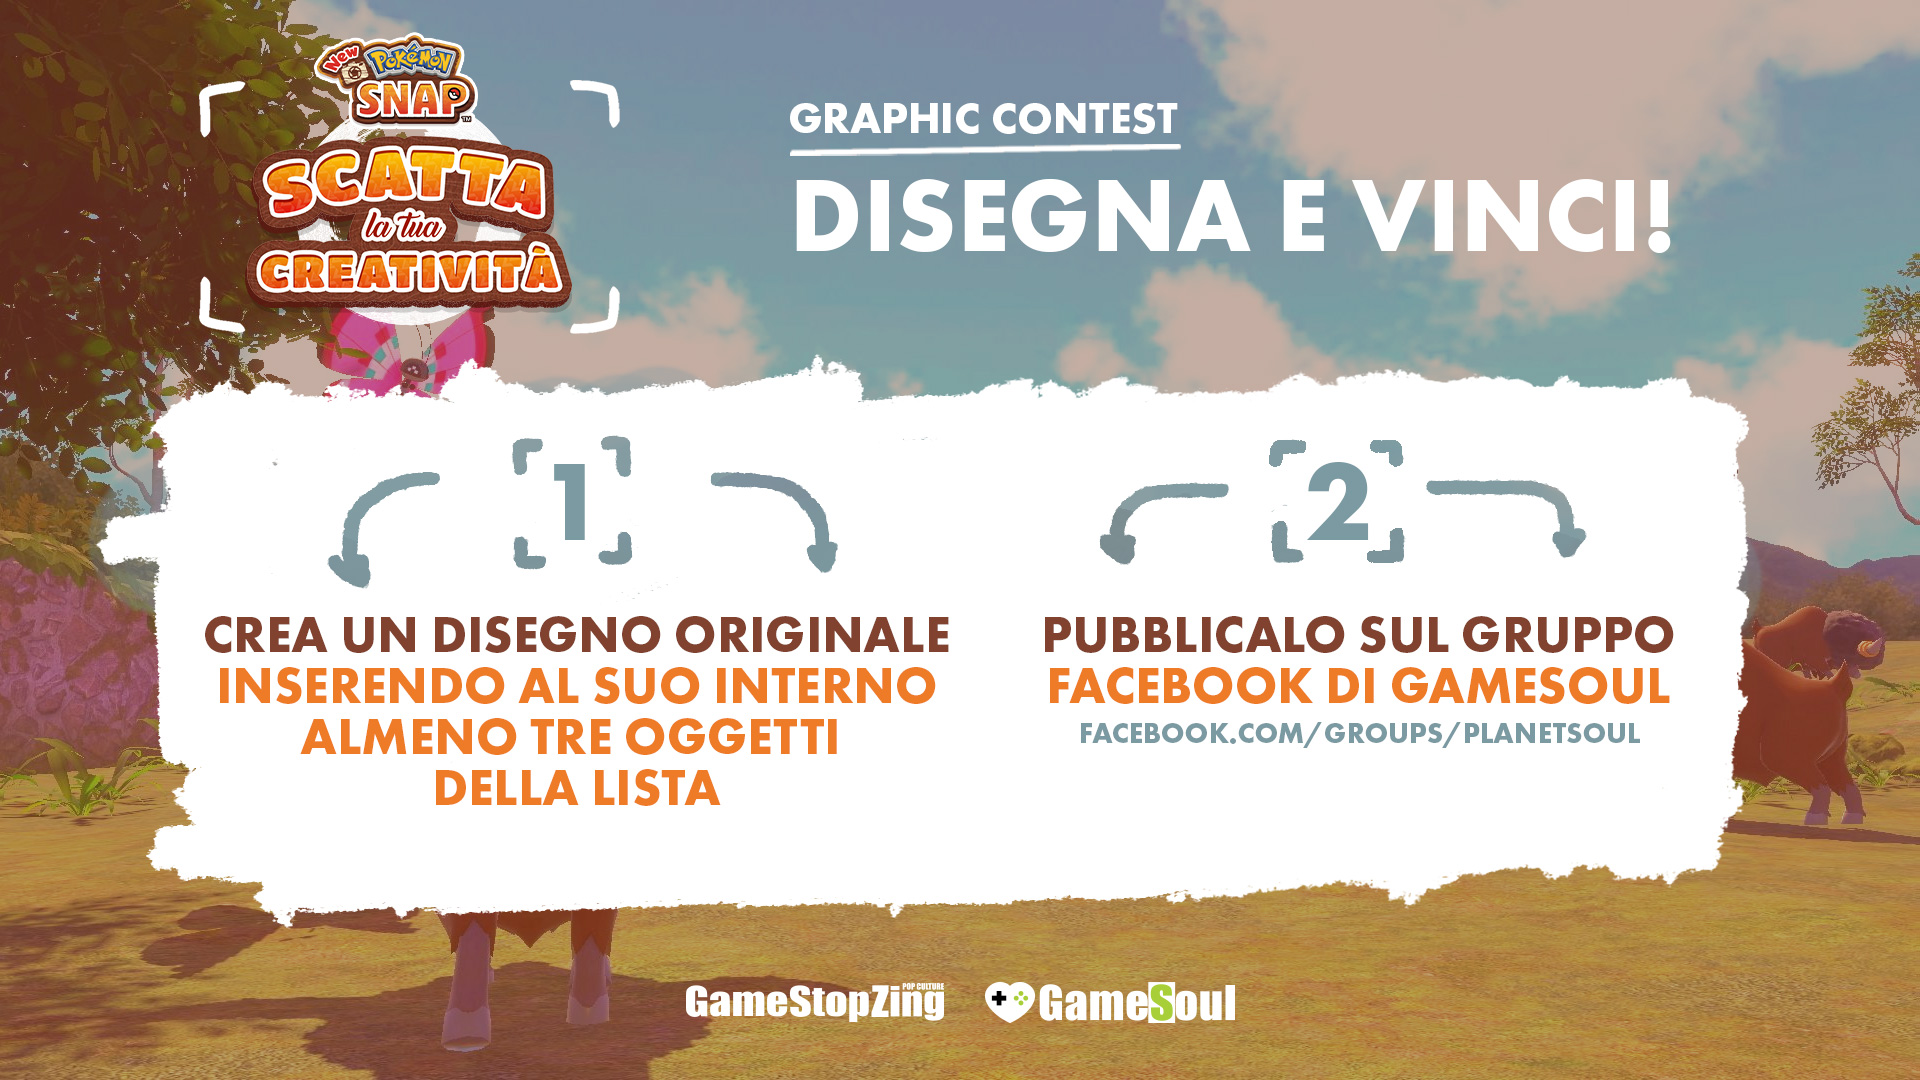 Graphic contest New Pokémon Snap, come si svolge